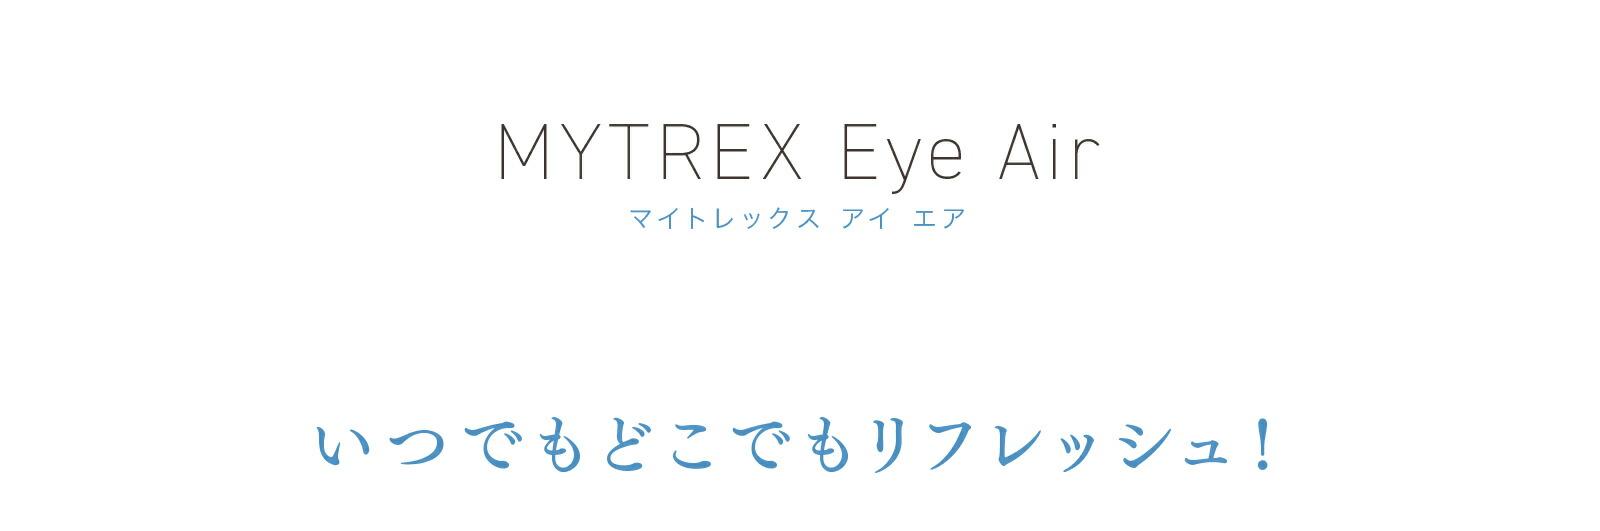 MYTREX Eye Air マイトレックス アイ エア ノーズワイヤー 遮光